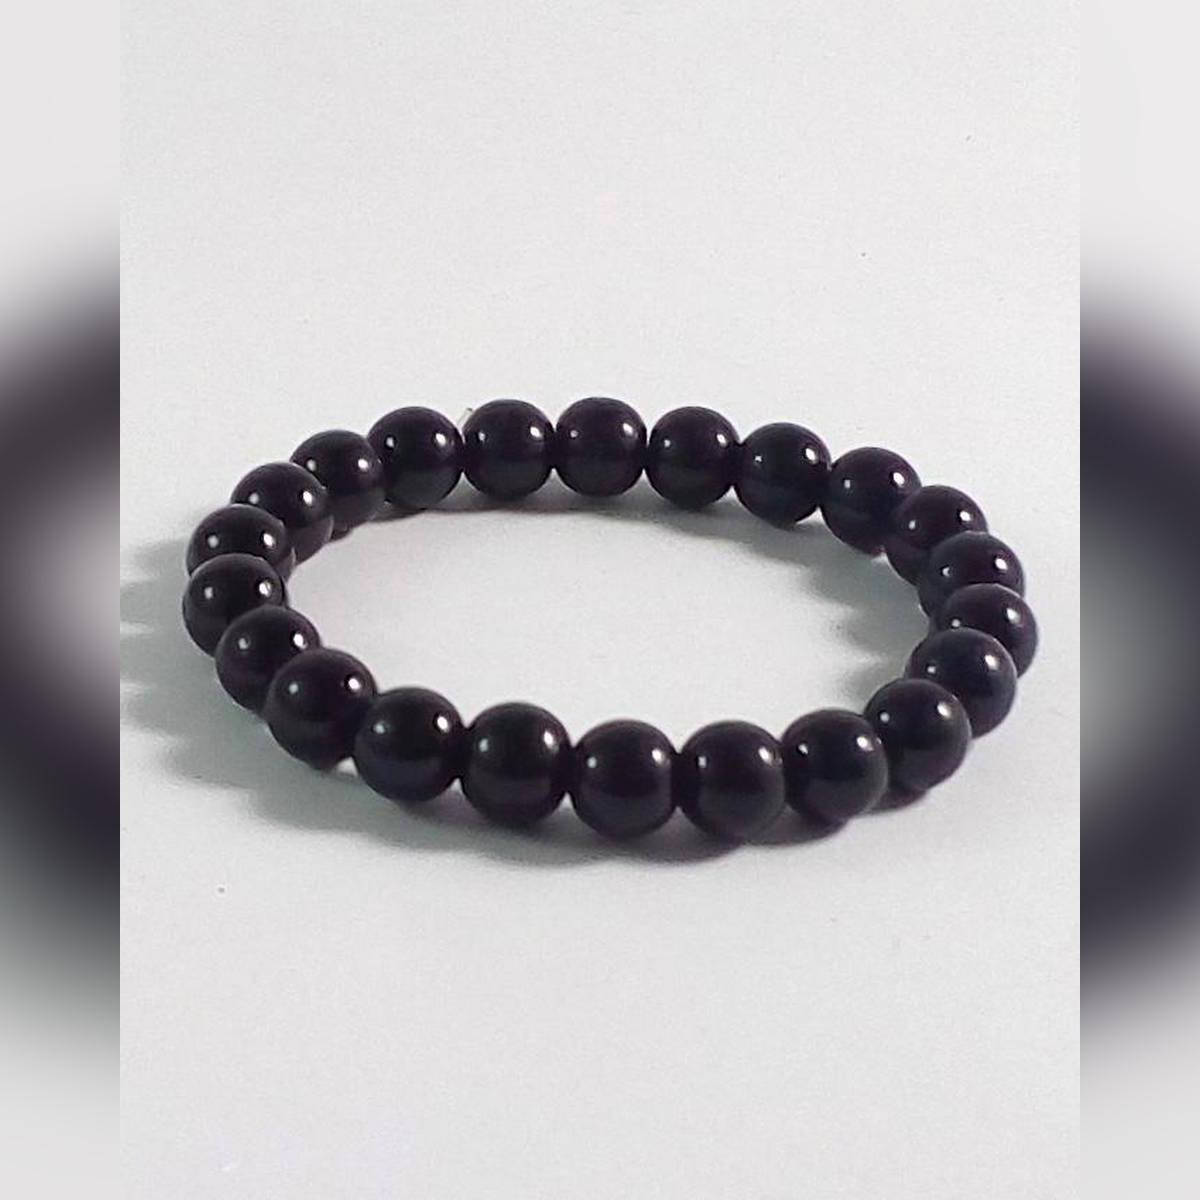 Black Bead Charm Bracelet